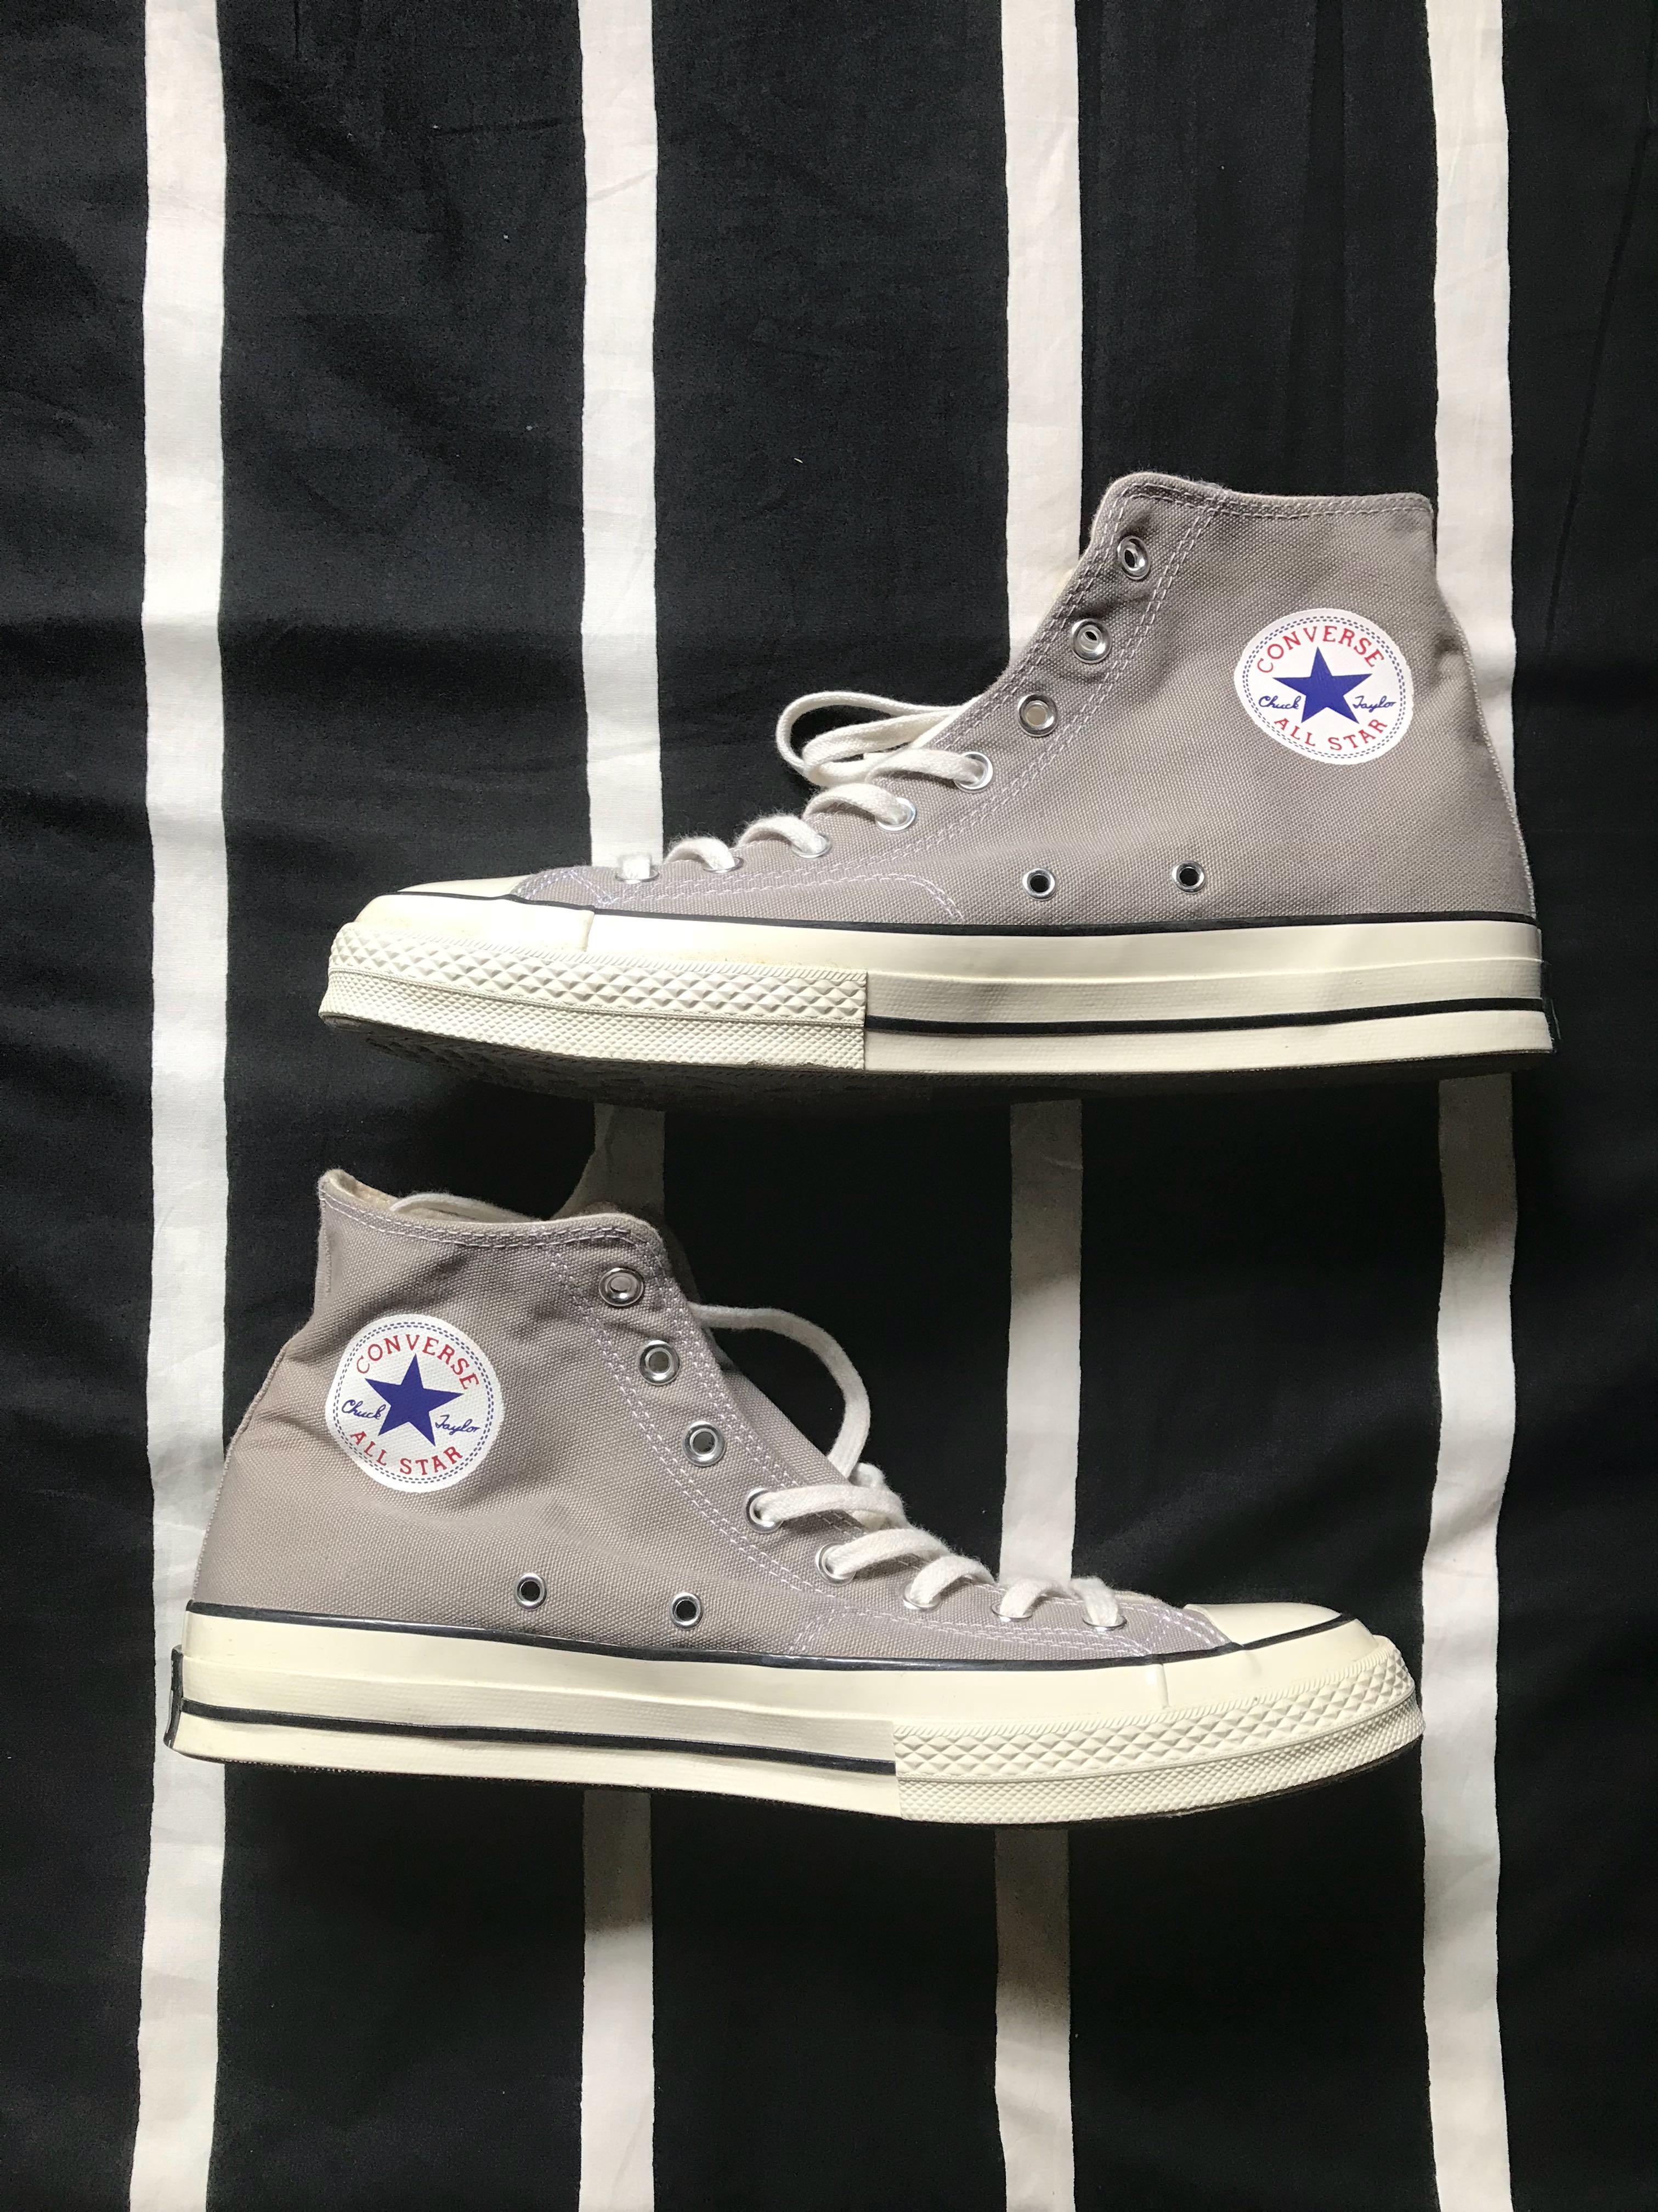 262b85bdfffb90 Converse All Star Chuck Taylor 70 s High Cut